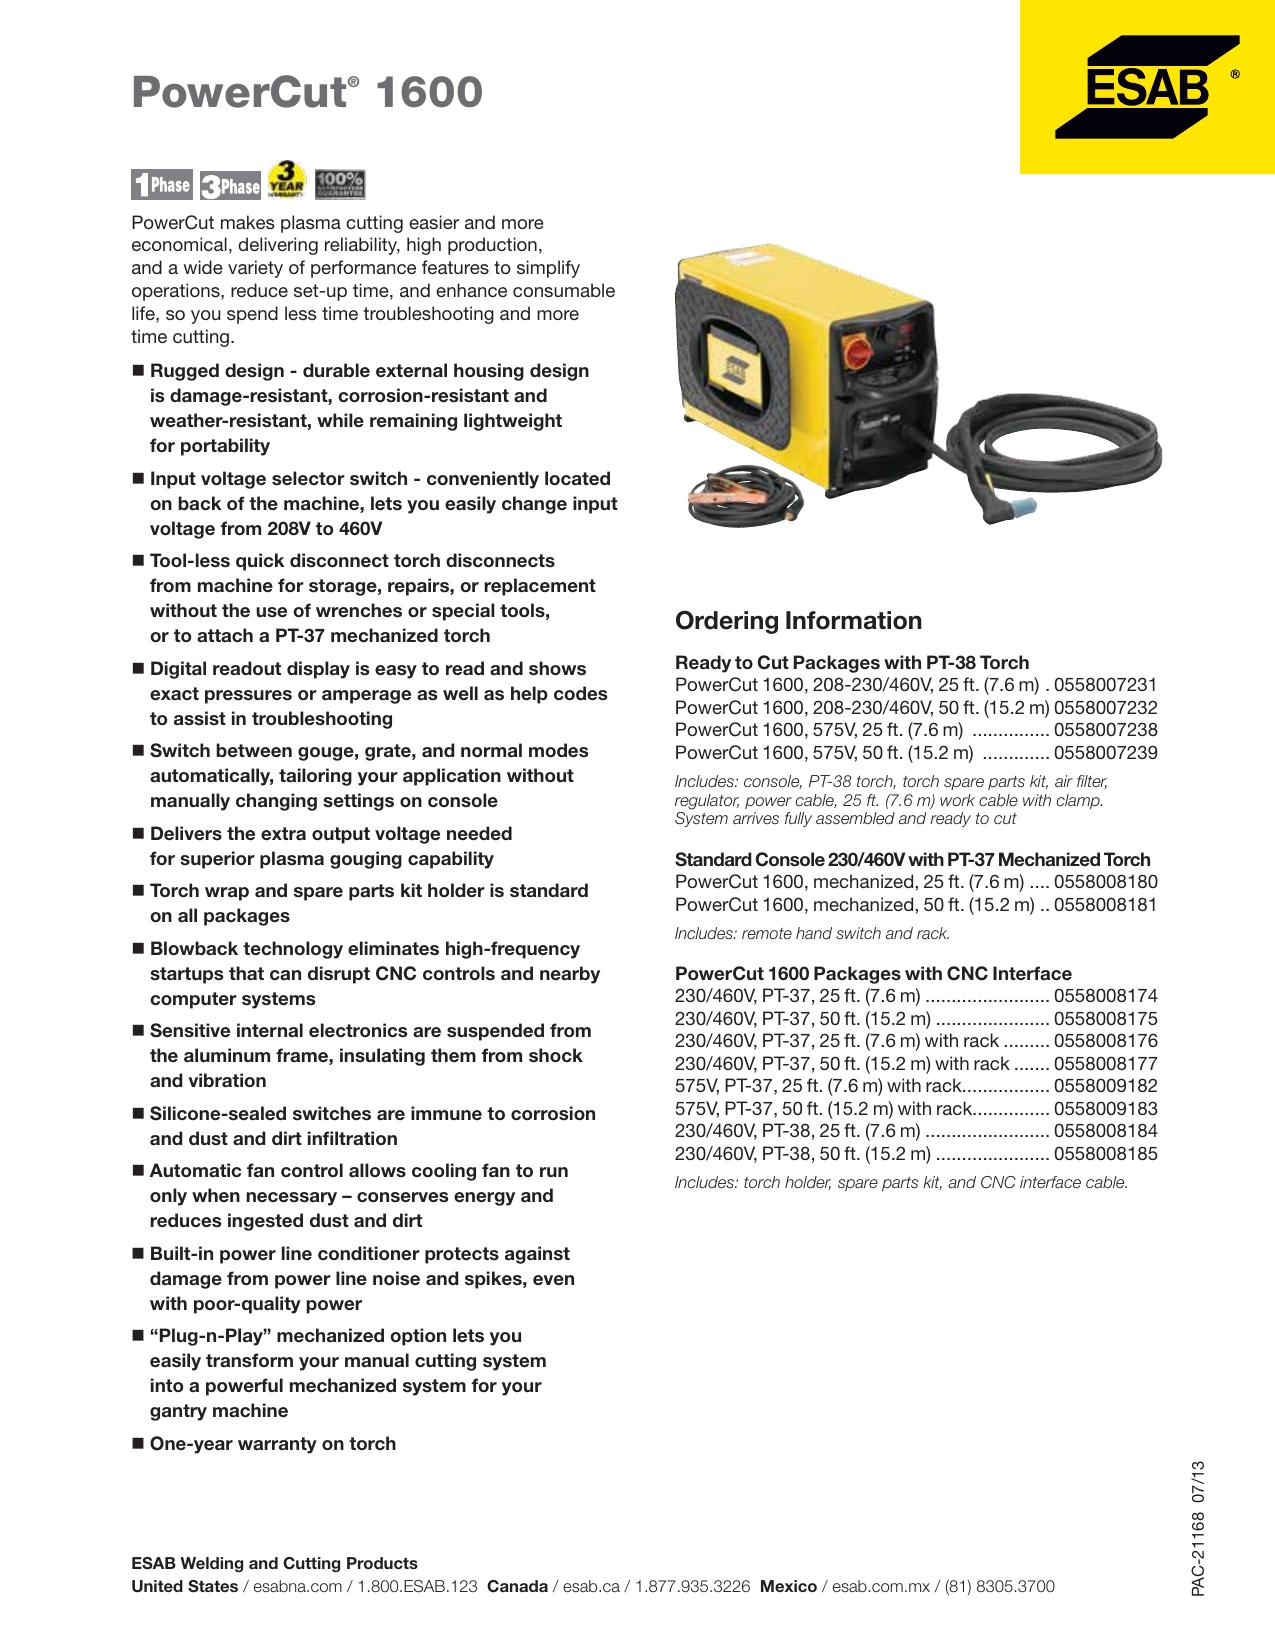 Powercut 1600 Esab Welding Cutting Products Manualzz